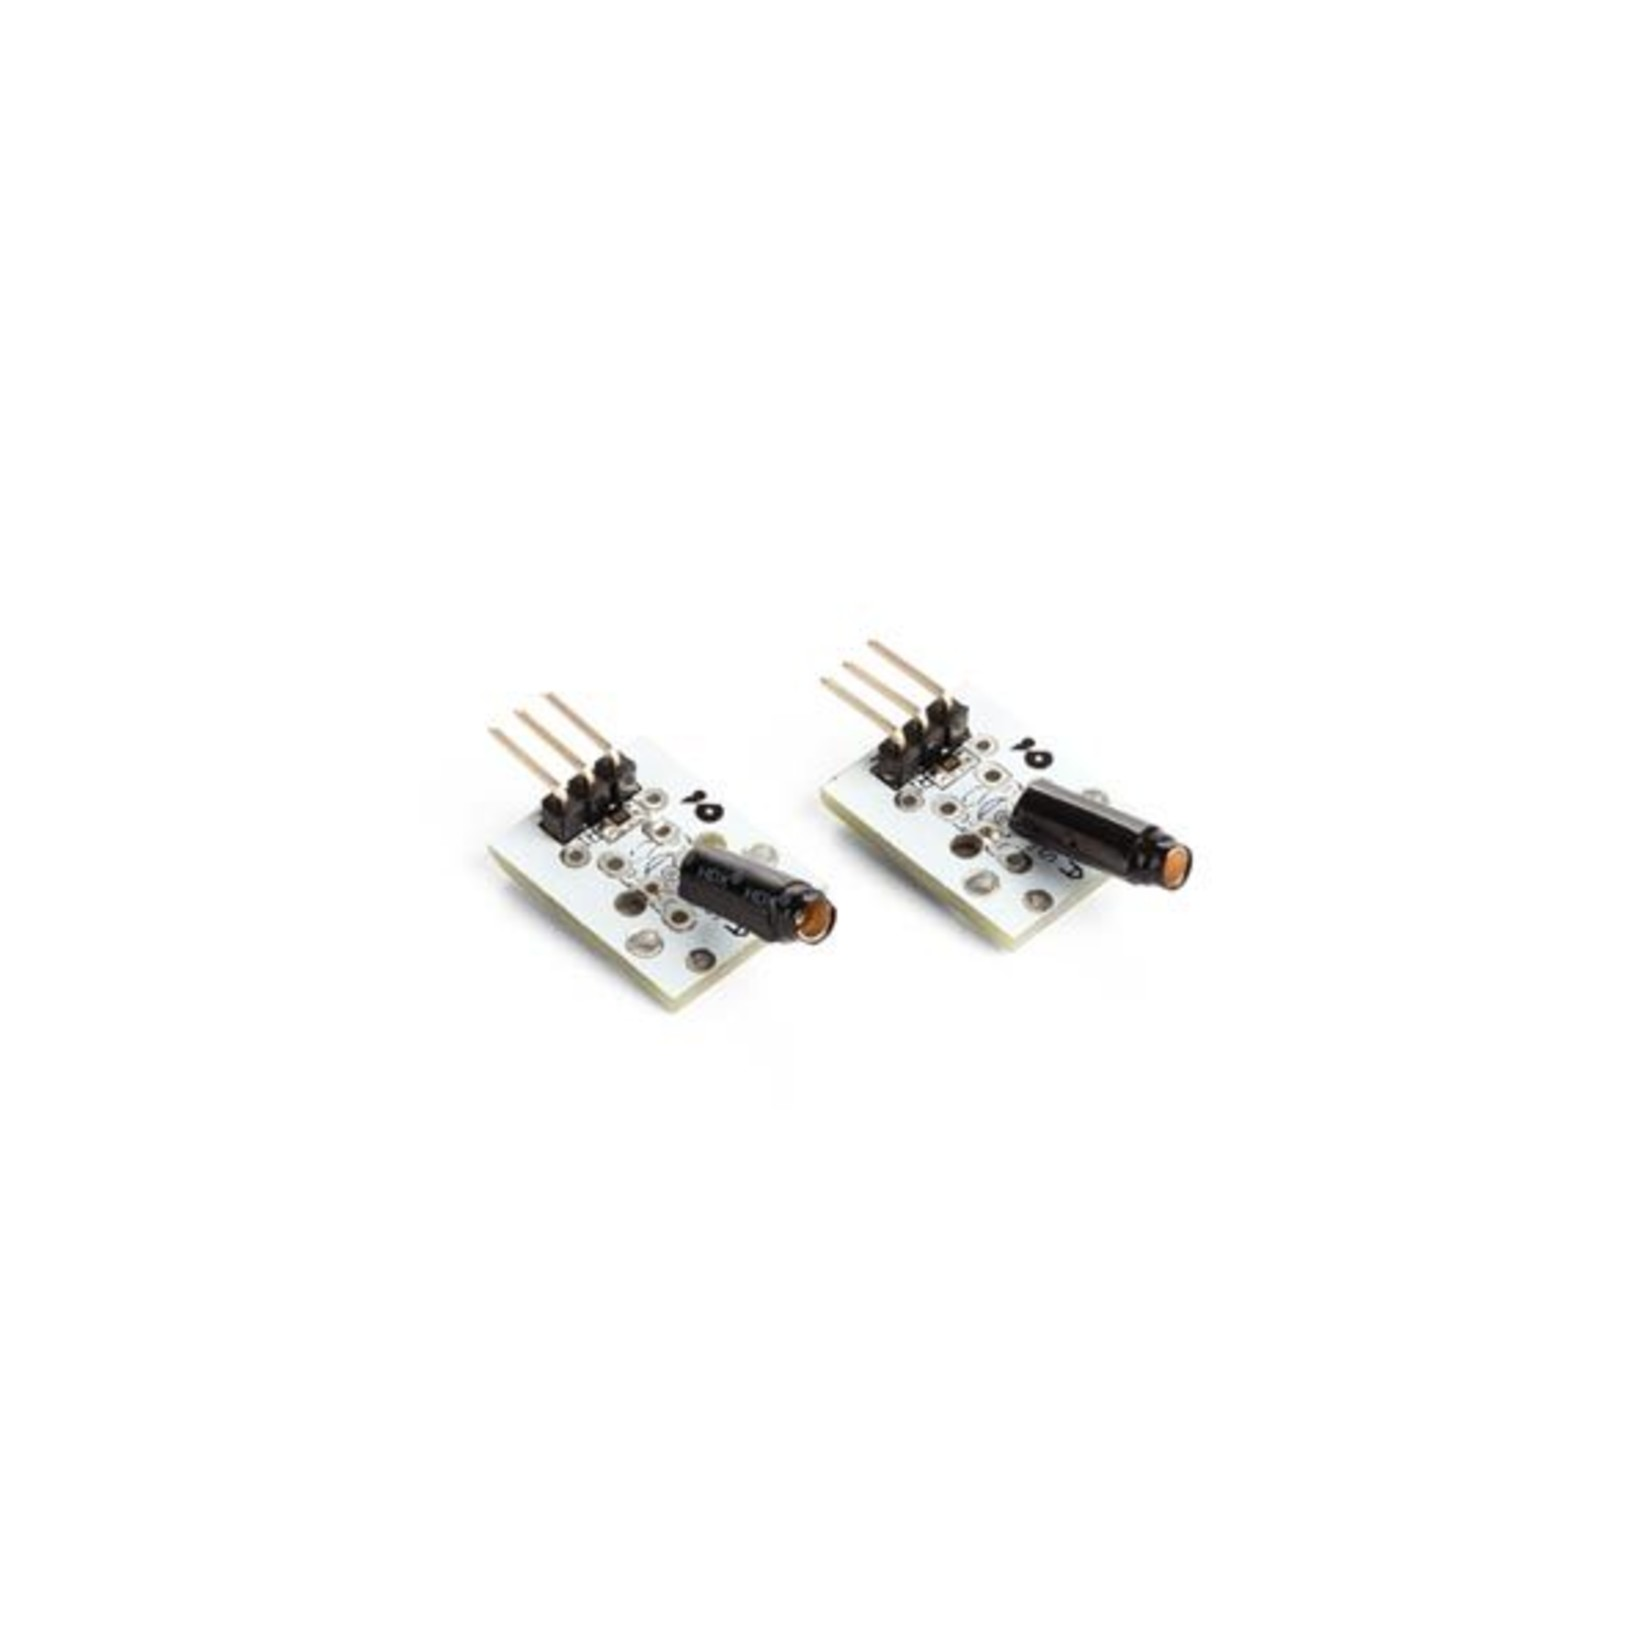 Velleman ARDUINO® comatible vibration / shock sensor (2 pcs.)